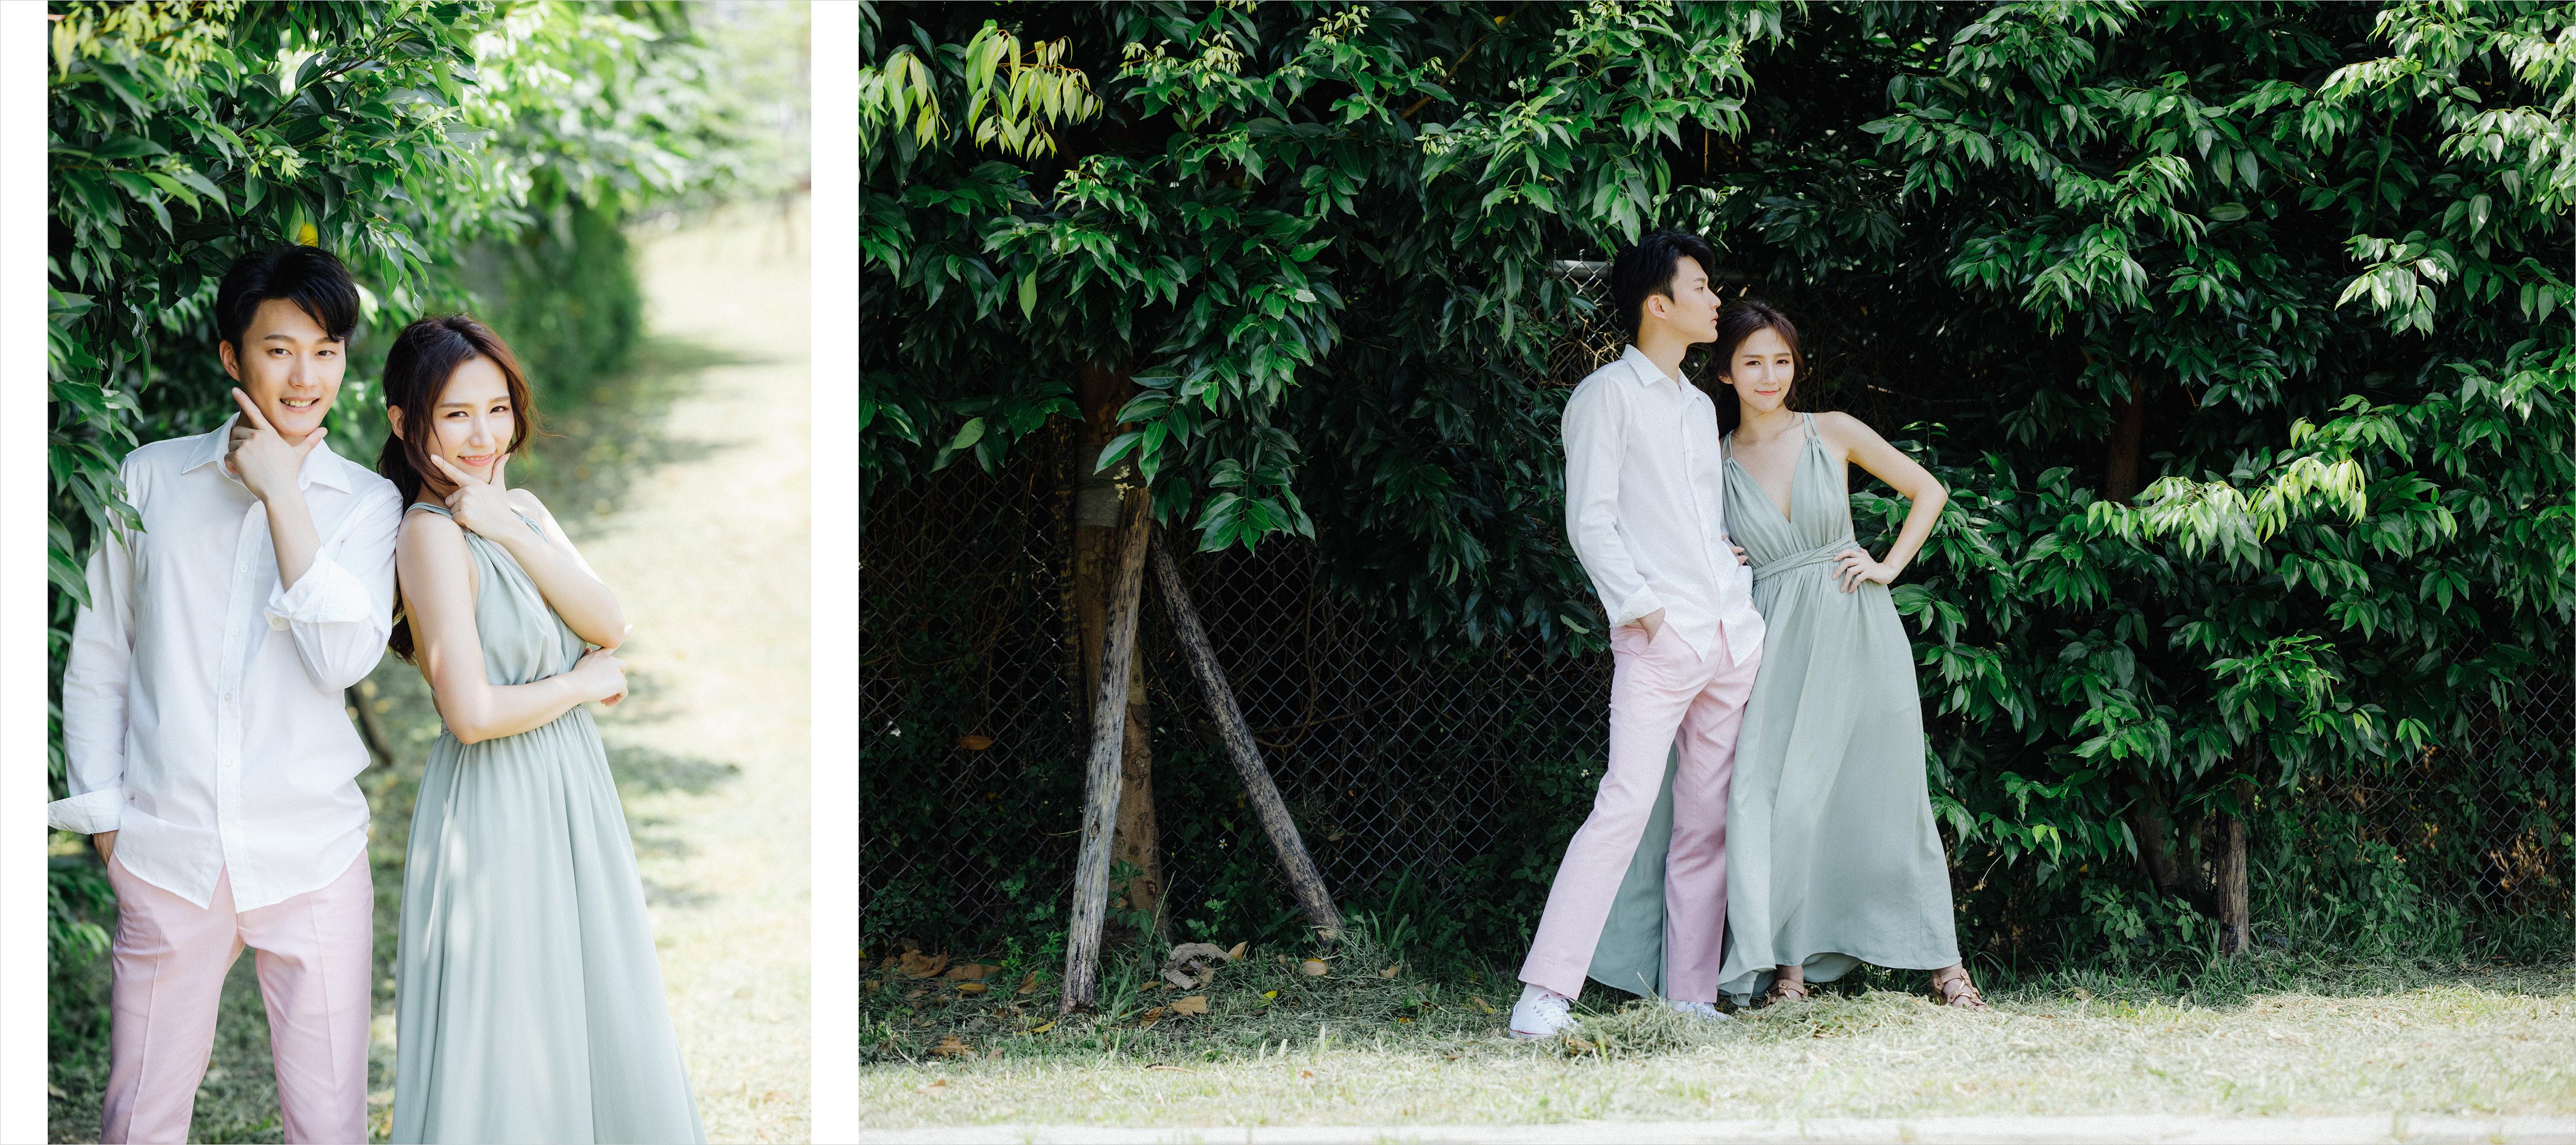 48592325107 68d17bf577 o - 【自主婚紗】+Ying&Wiwi+